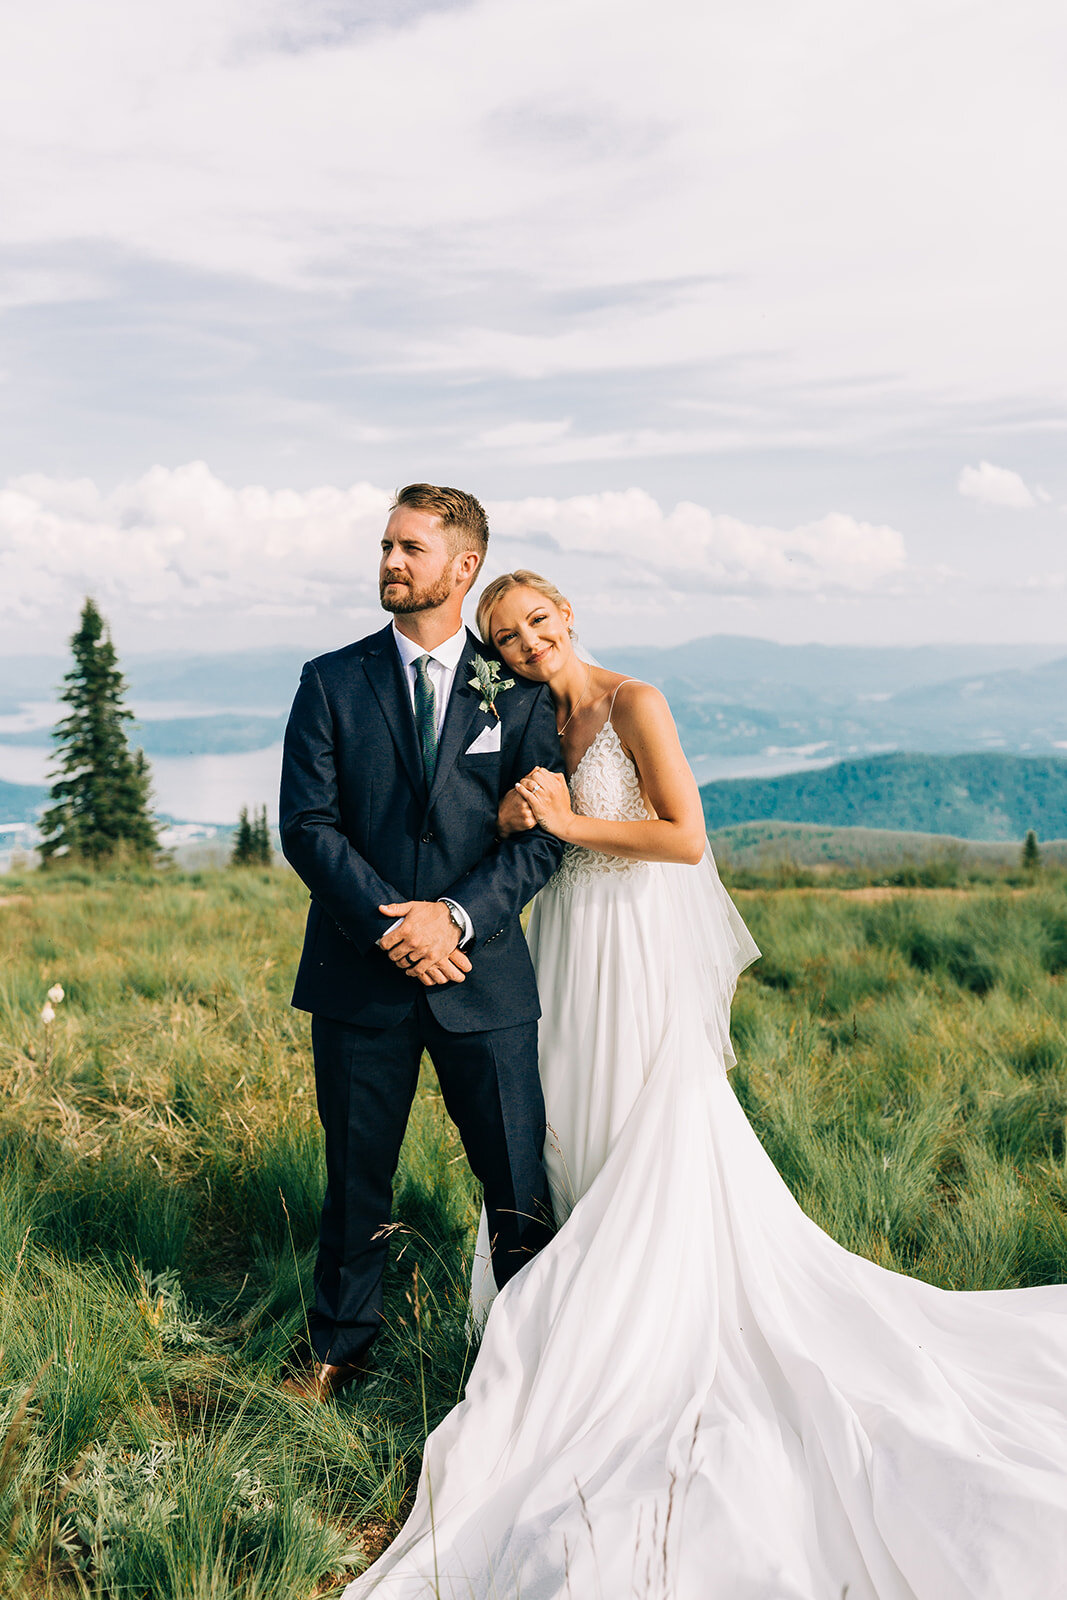 bride and groom long train gown portraits spokane wedding